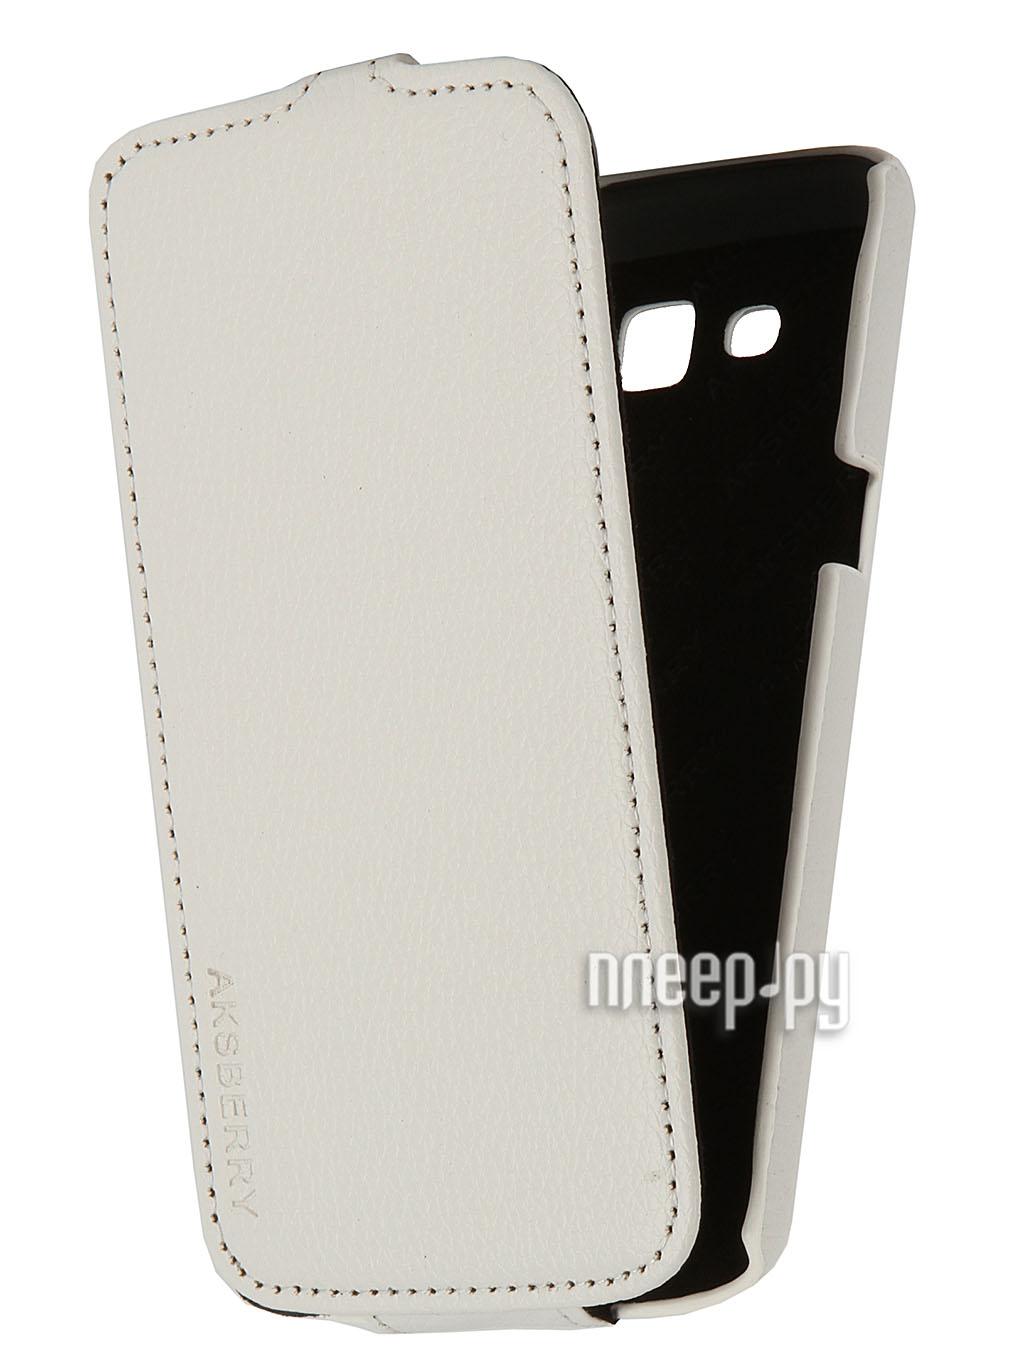 Аксессуар Чехол Samsung SM-G7102 Galaxy Grand 2 / Grand 2 Duos Aksberry White  Pleer.ru  1136.000